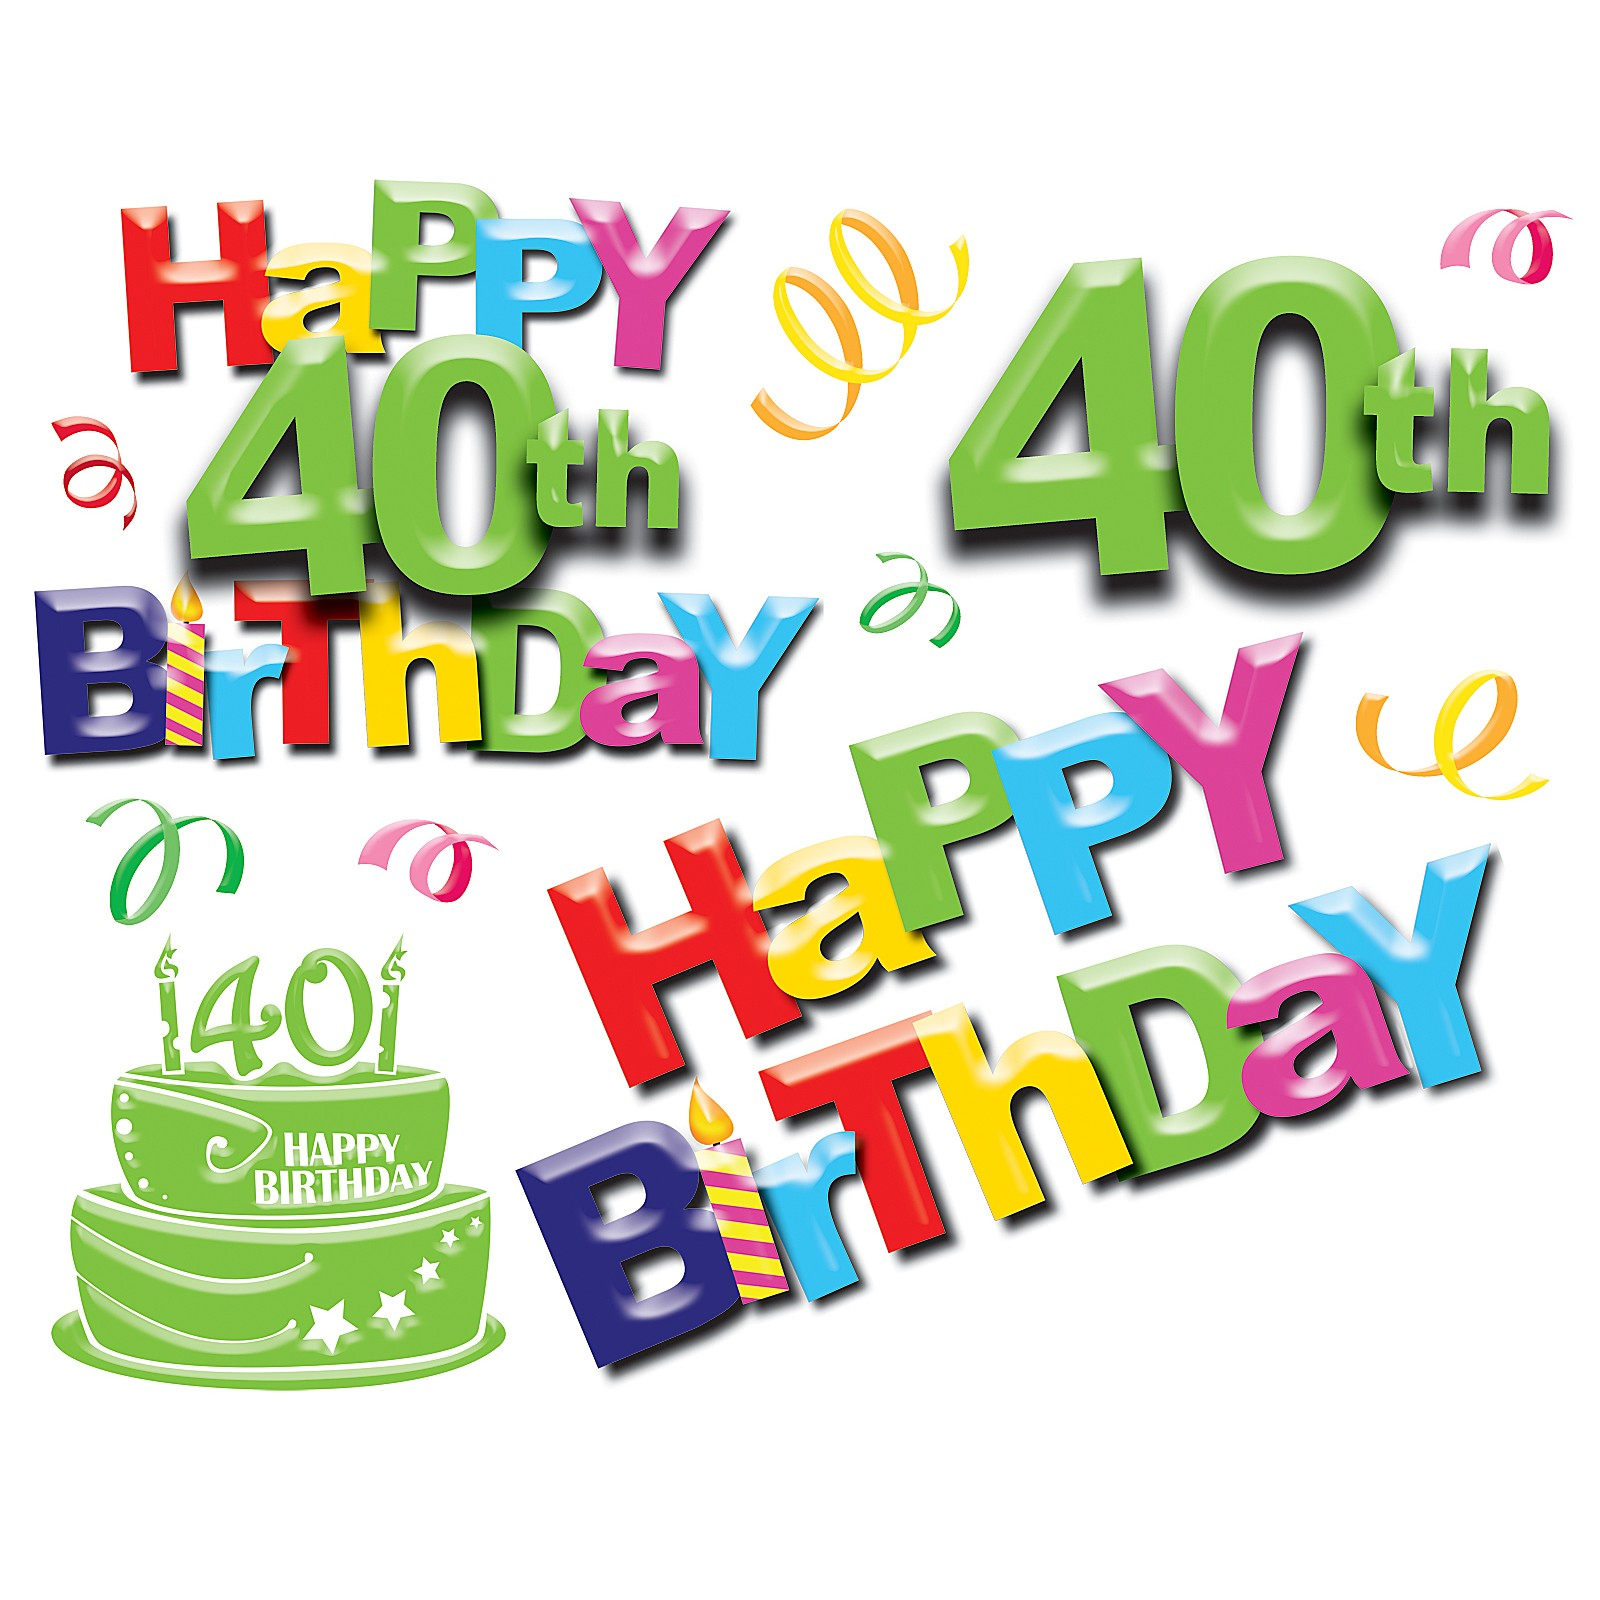 Man's 40th Birthday Clipart